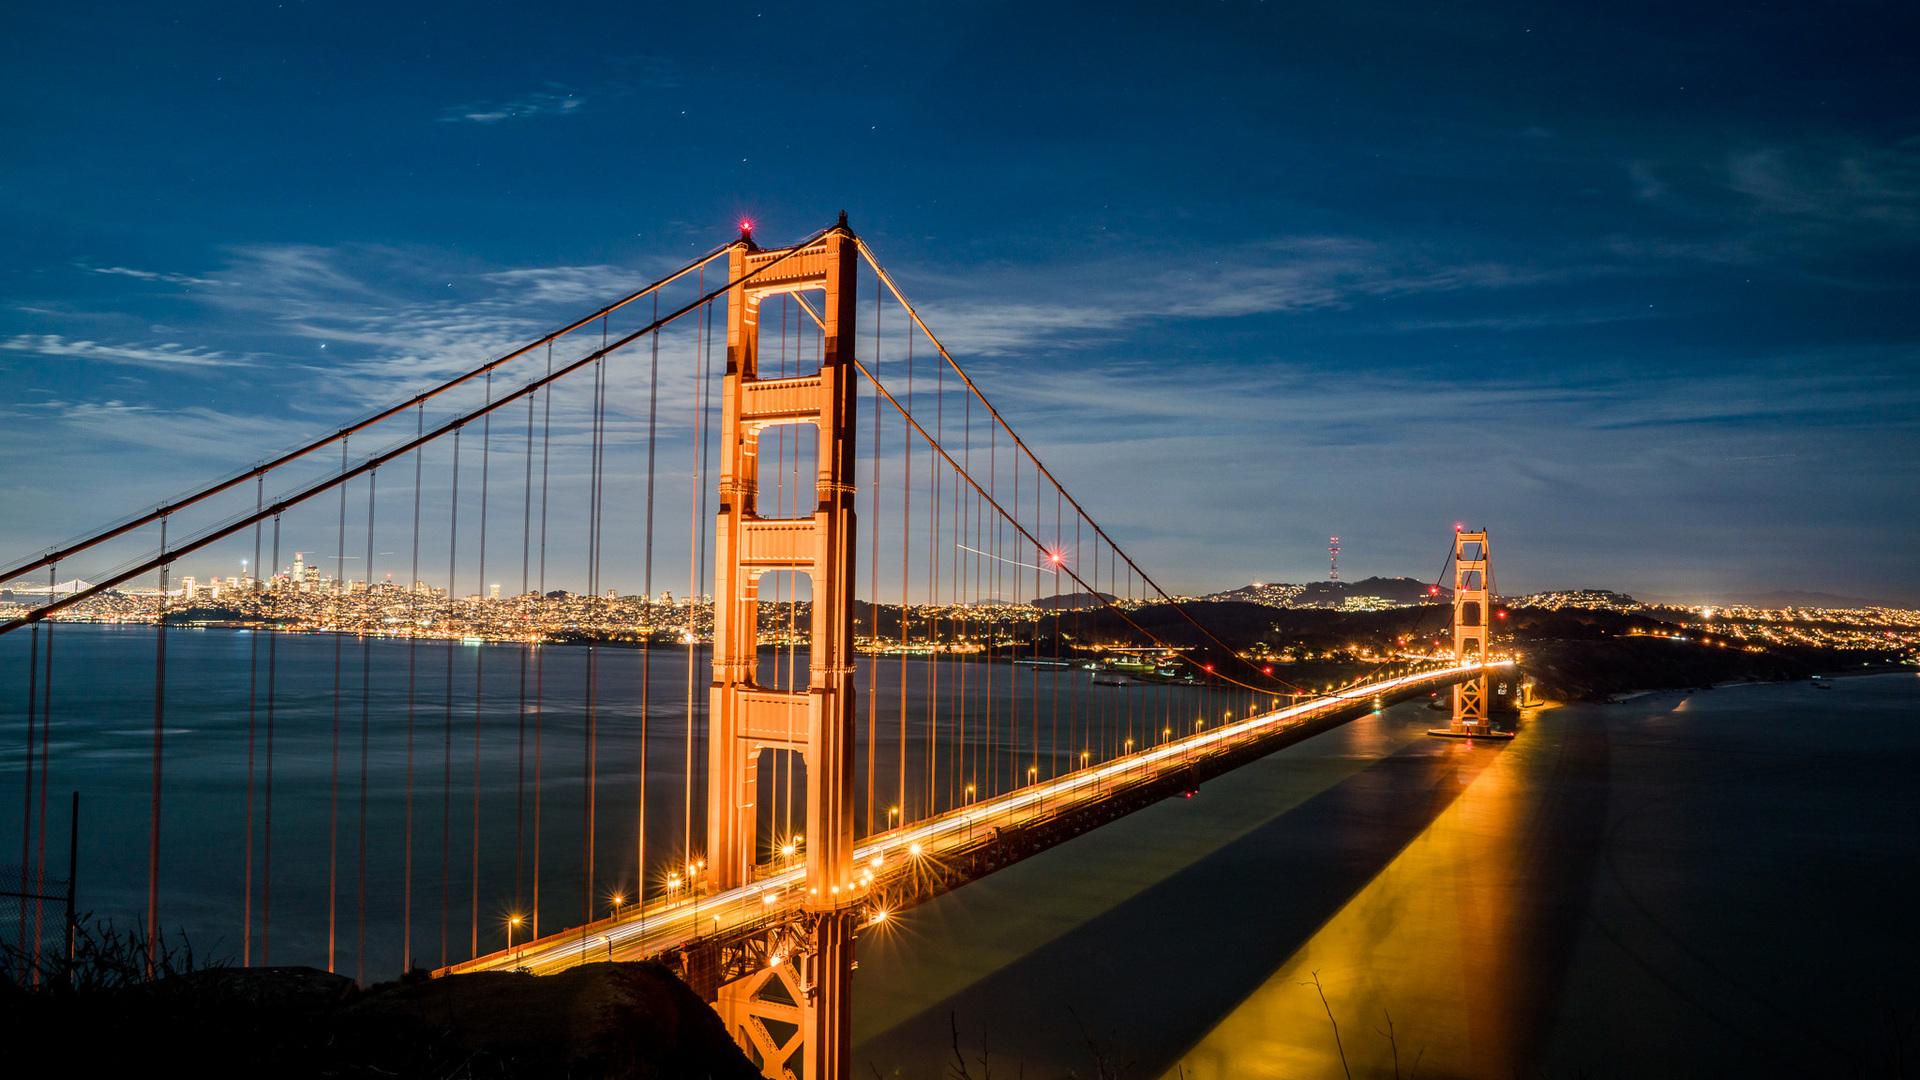 Must see Wallpaper Night Golden Gate Bridge - golden-gate-bridge-ly-1920x1080  Best Photo Reference-42887.jpg